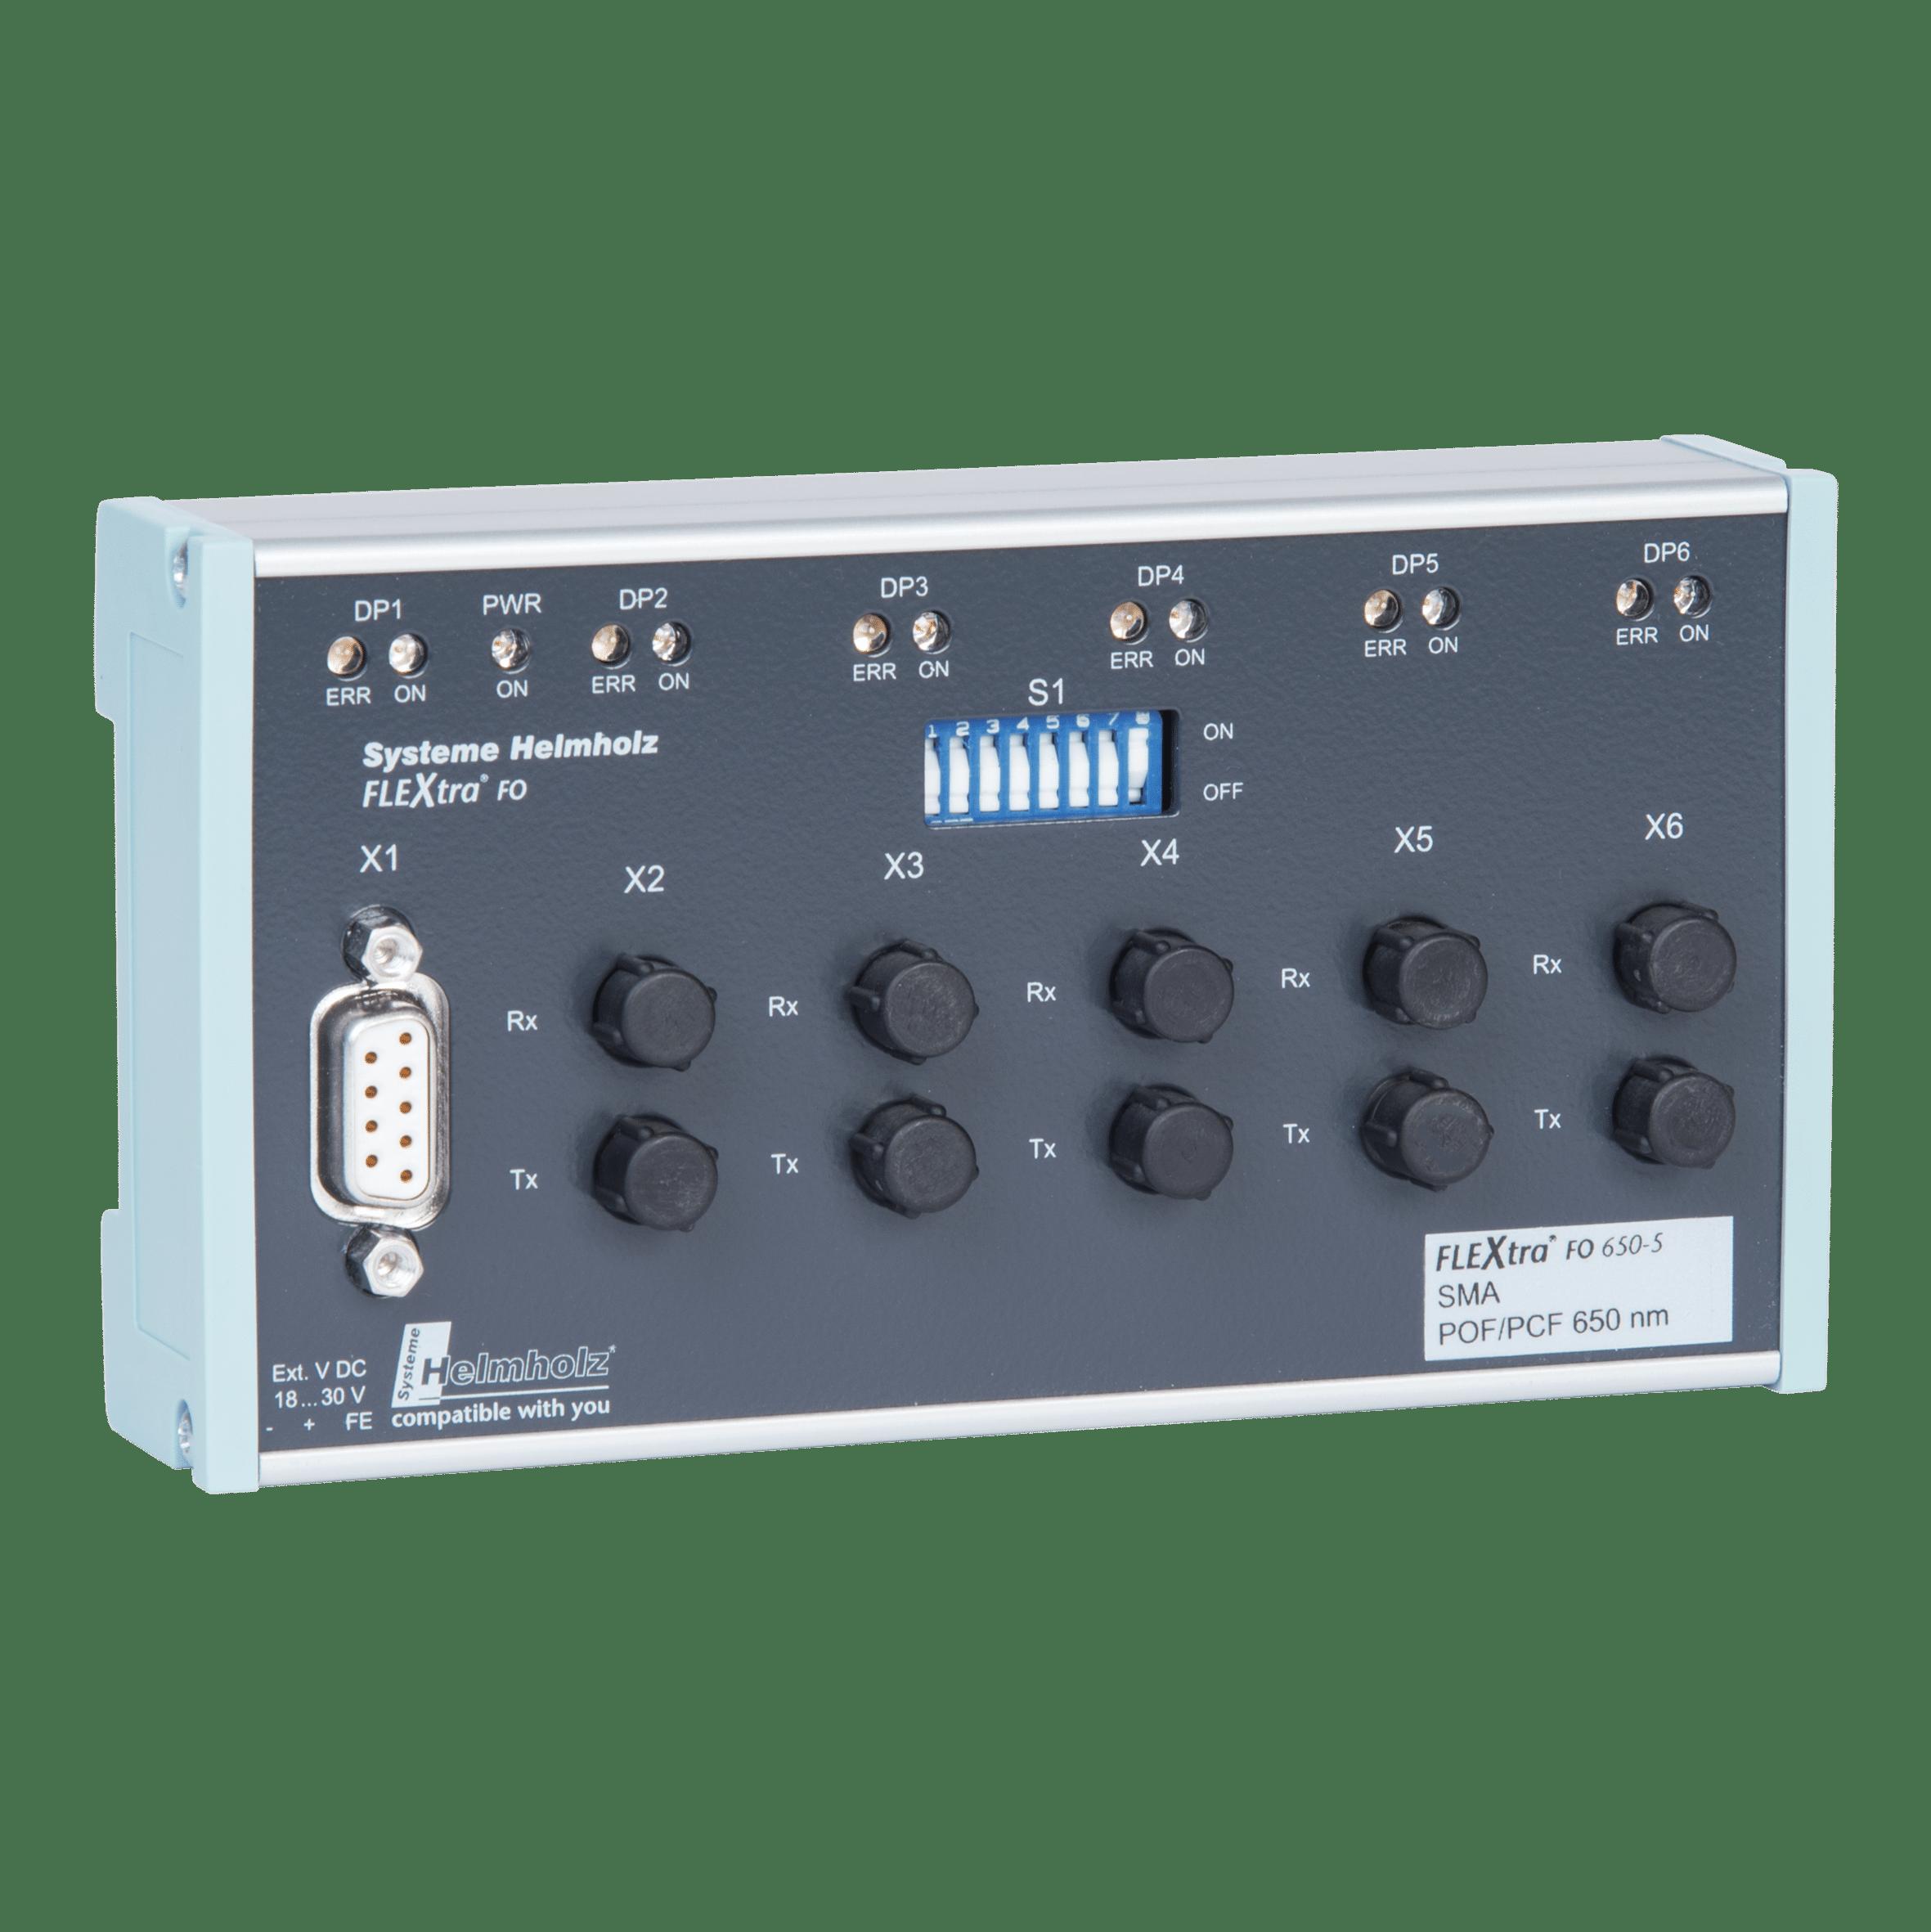 650-5, SMA, 650 nm, POF/PCF » Helmholz Benelux : Helmholz